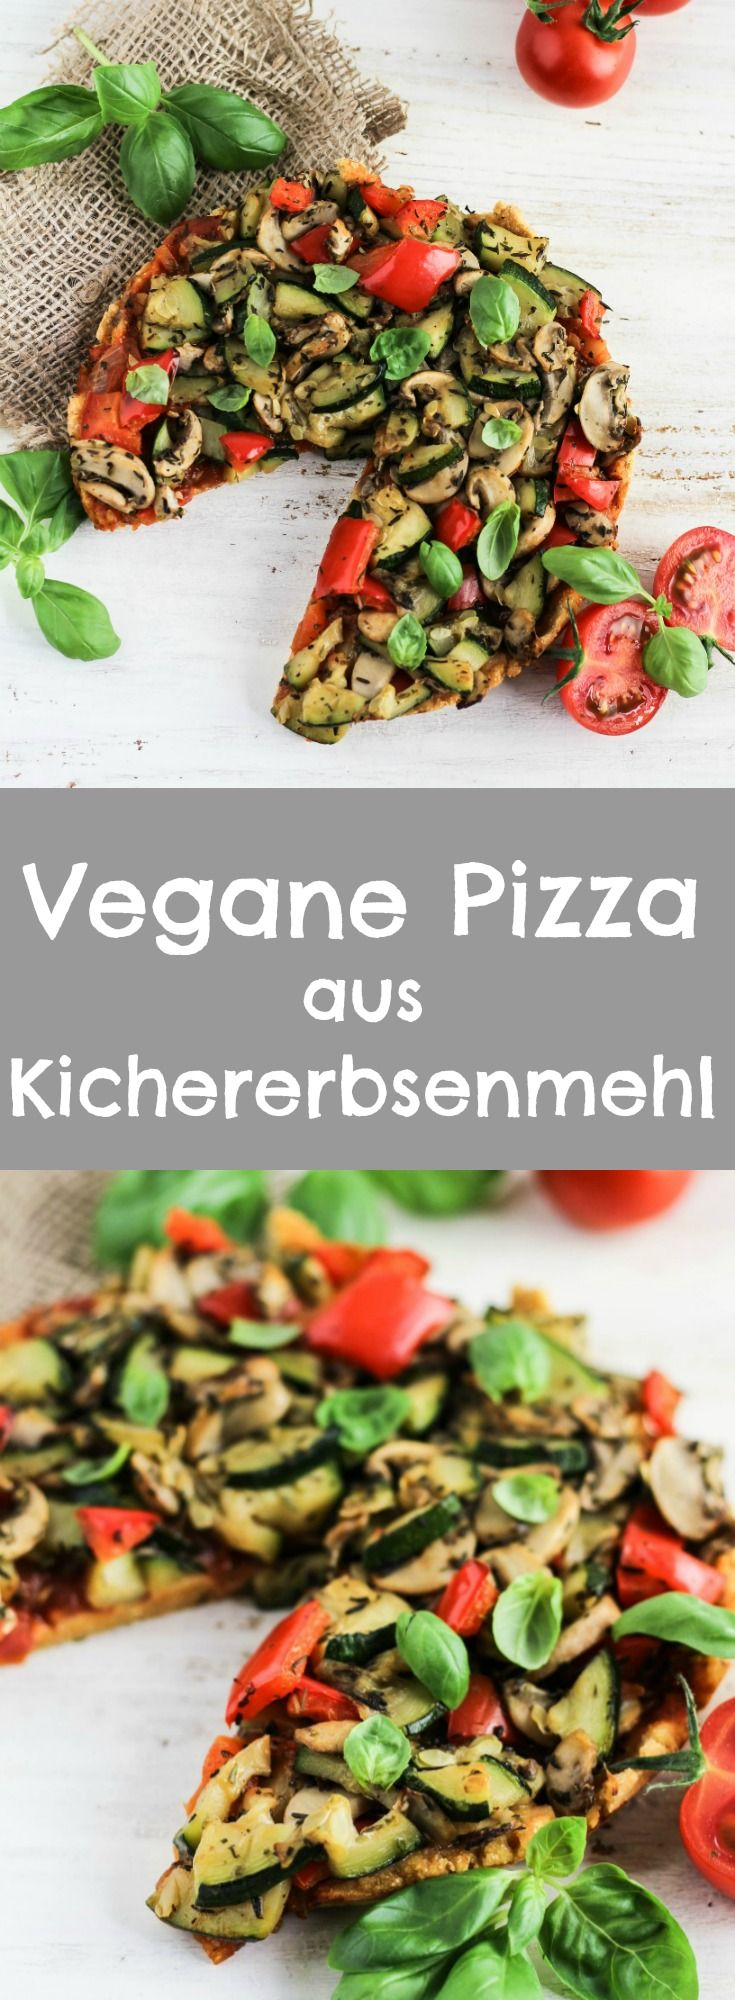 VEGANE PIZZA – SUPER LECKERE GESUNDE PIZZA AUS KICHERERBSENMEHL